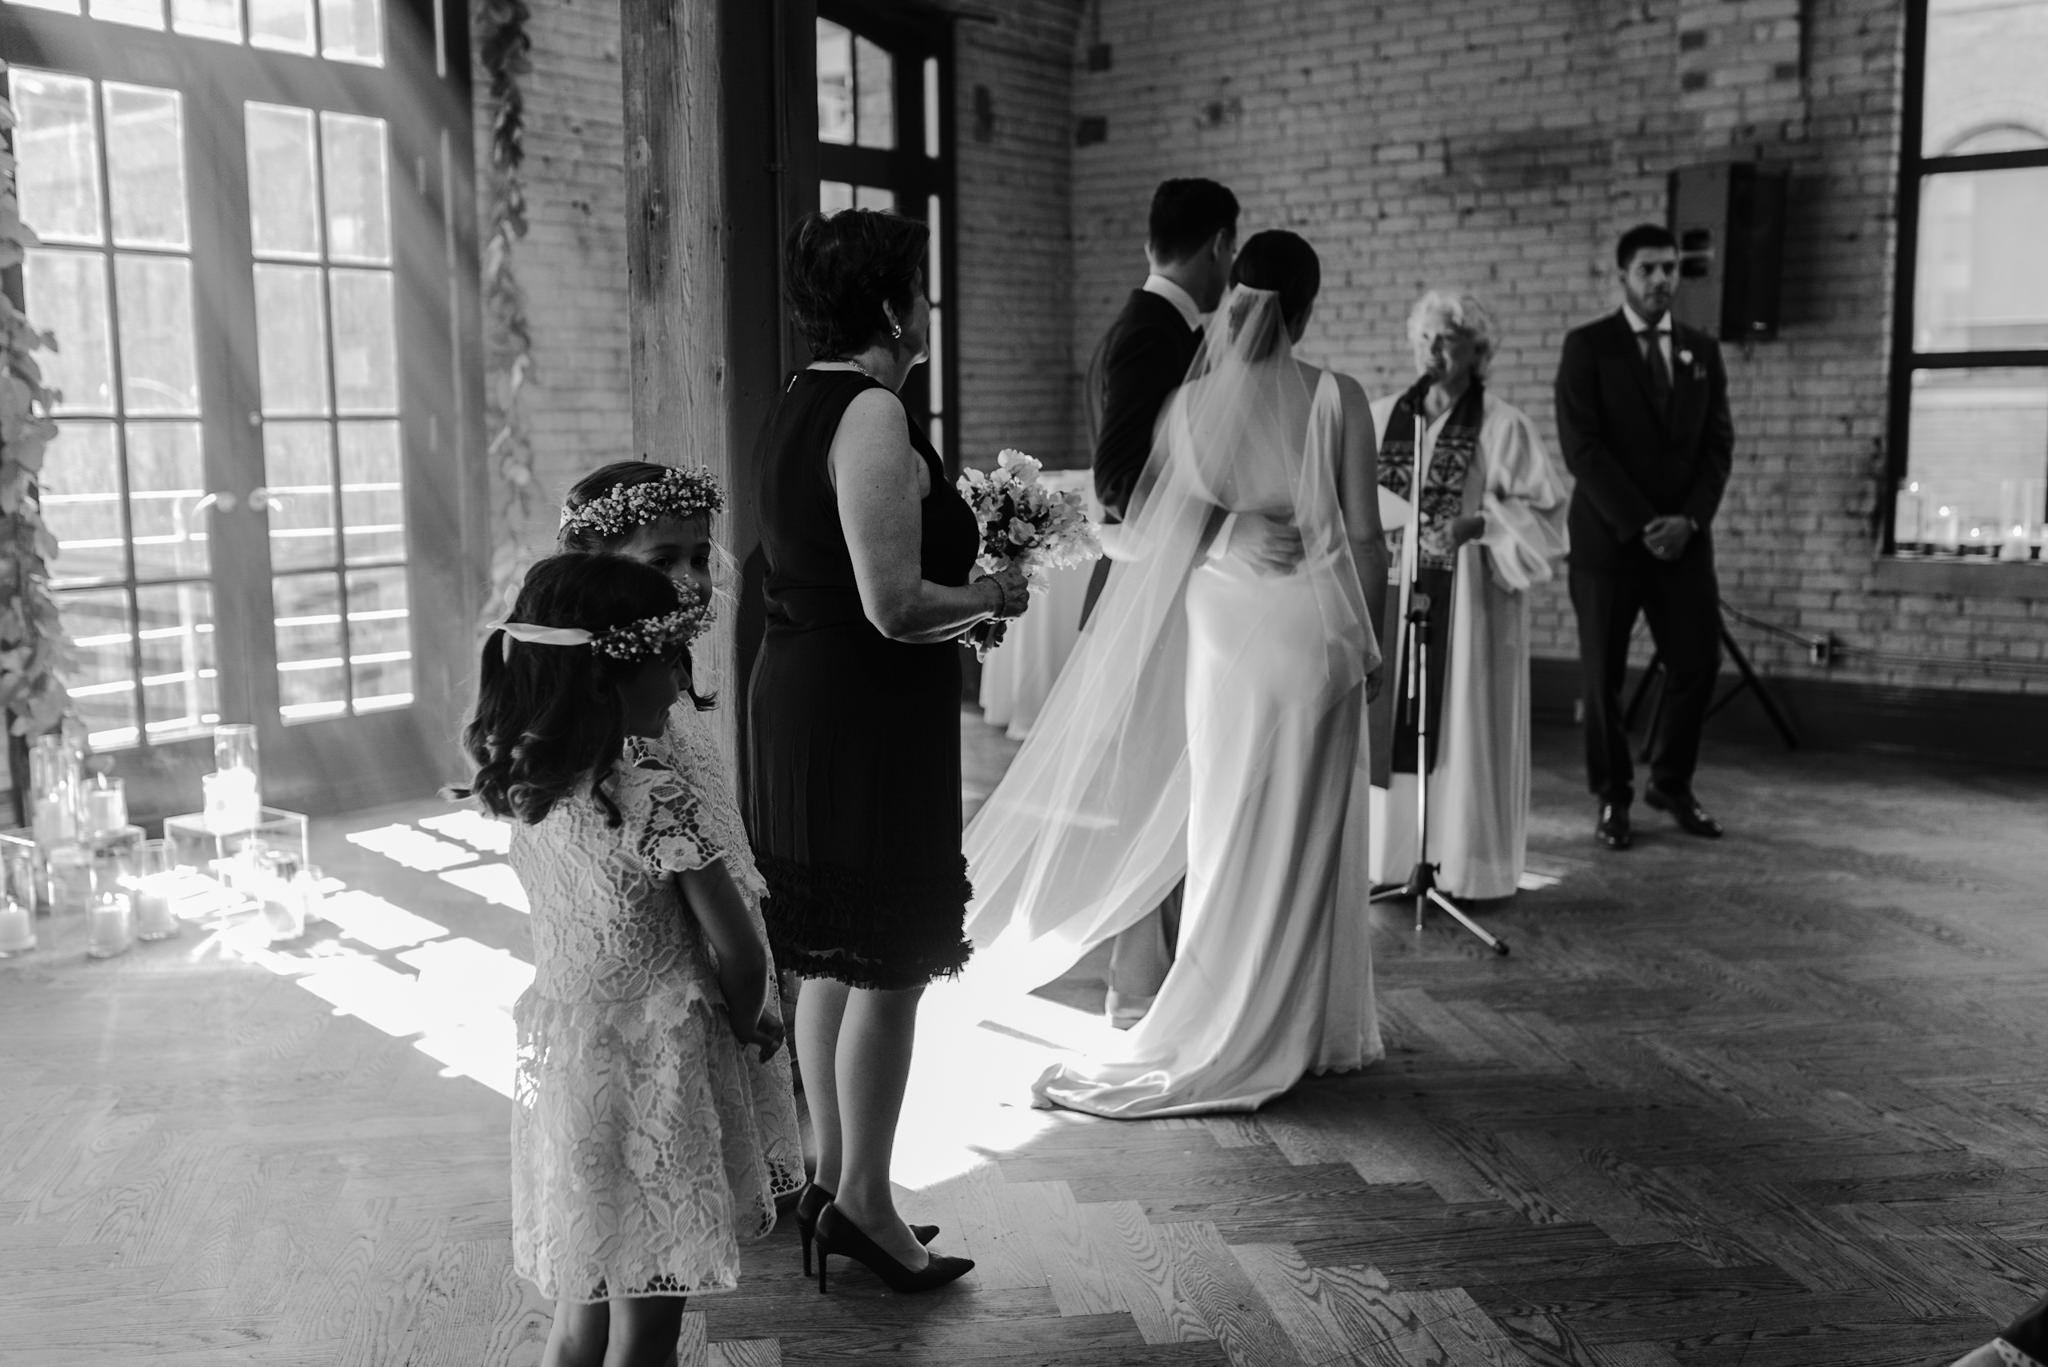 106-wedding-ceremony-storys-building-toronto-photographer-documentary.jpg